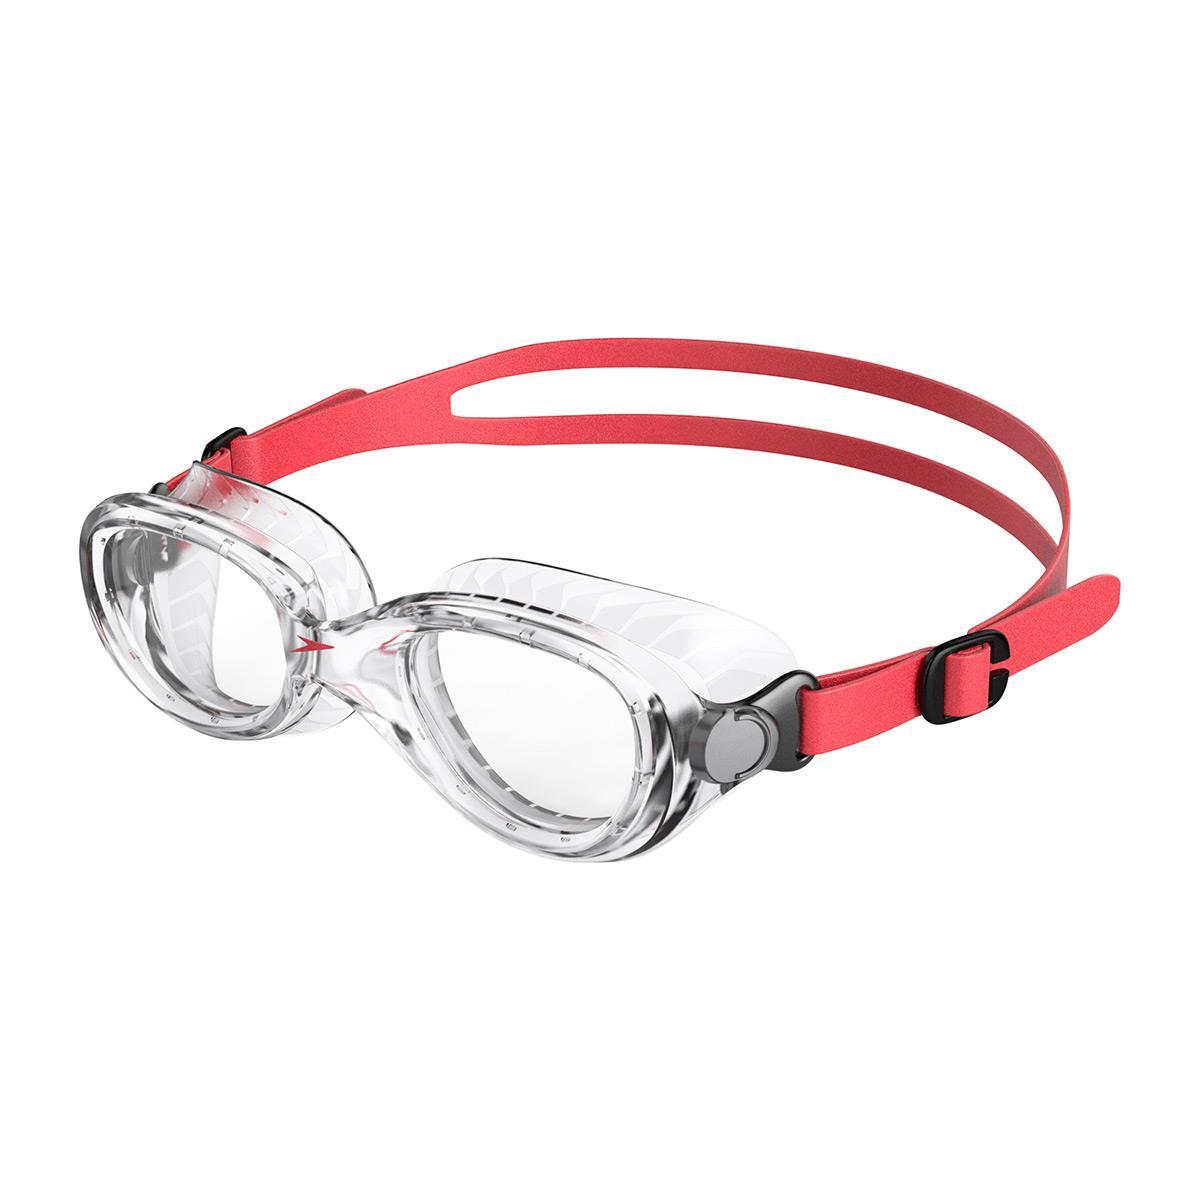 Speedo Futura Classıc JU RED/CLEAR Çocuk Gözlük